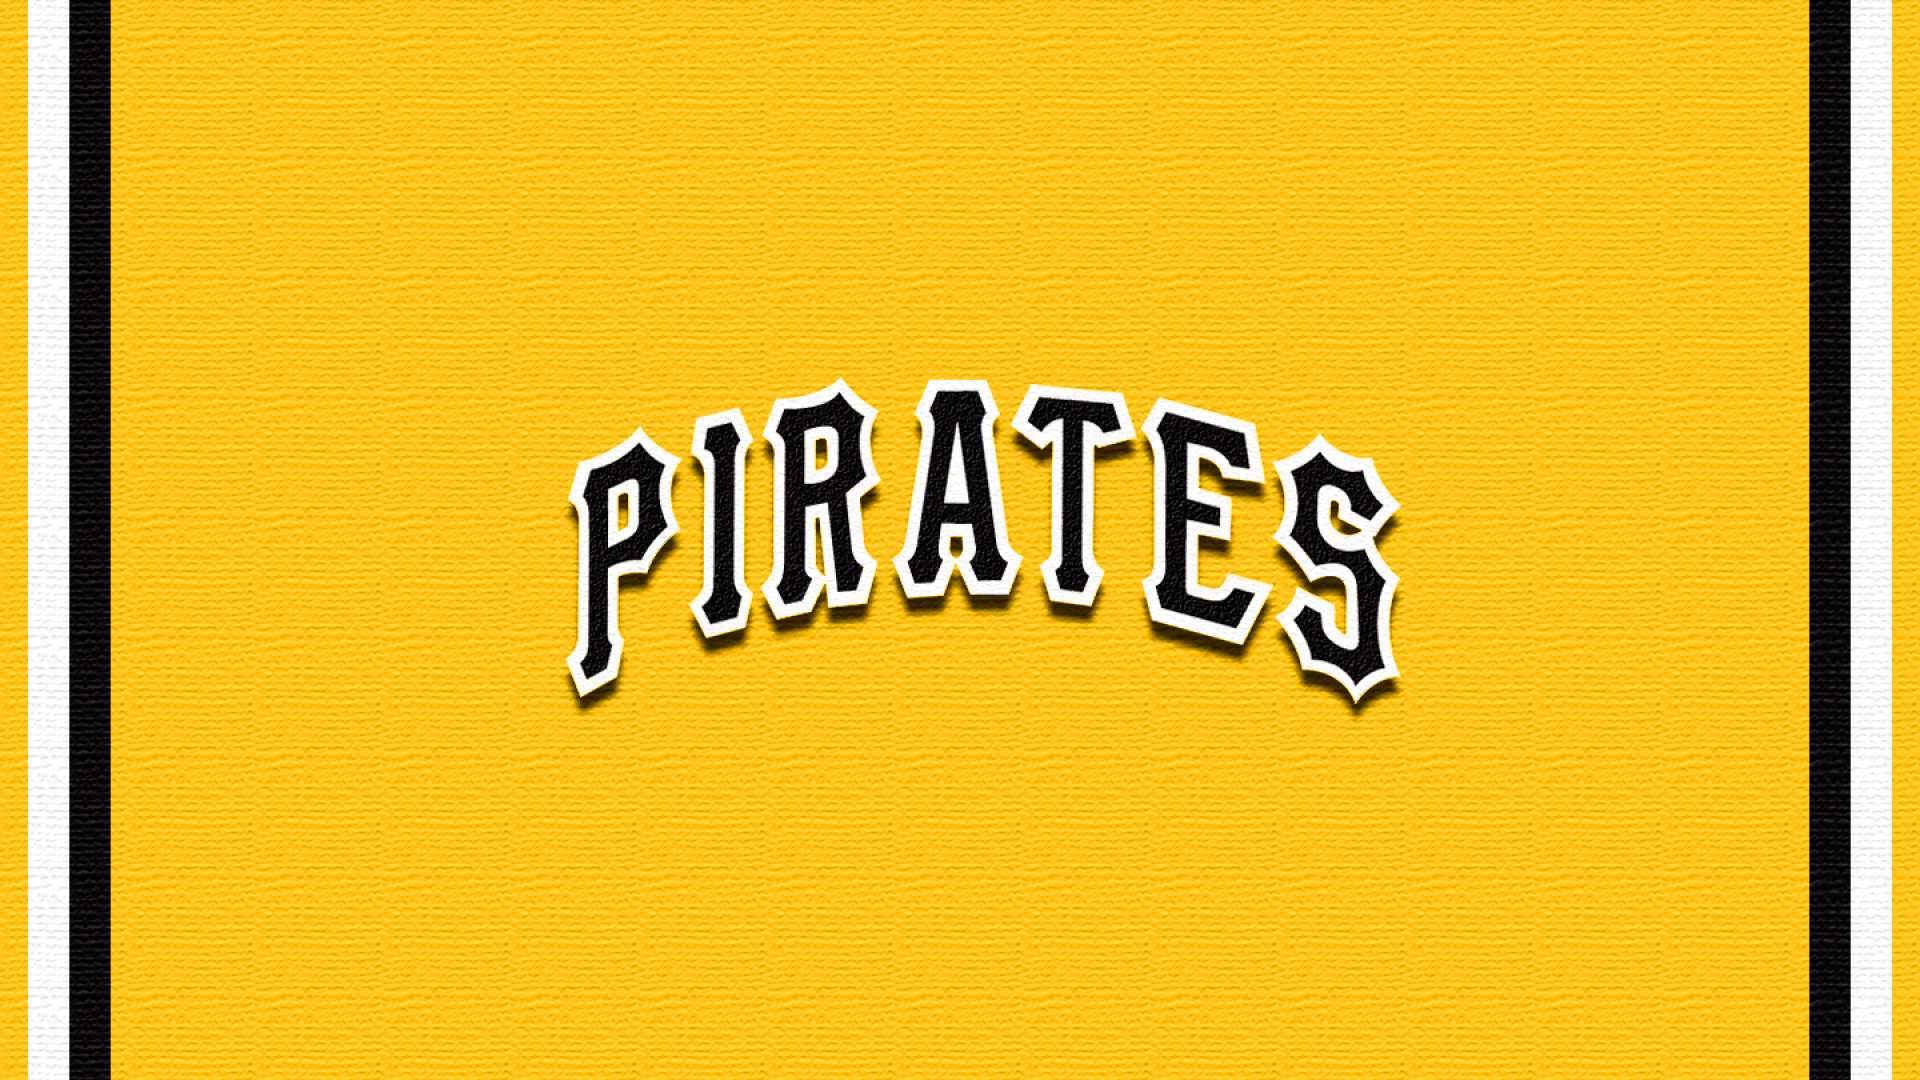 Pittsburgh Pirates Desktop Wallpaper 482109 Walldevil